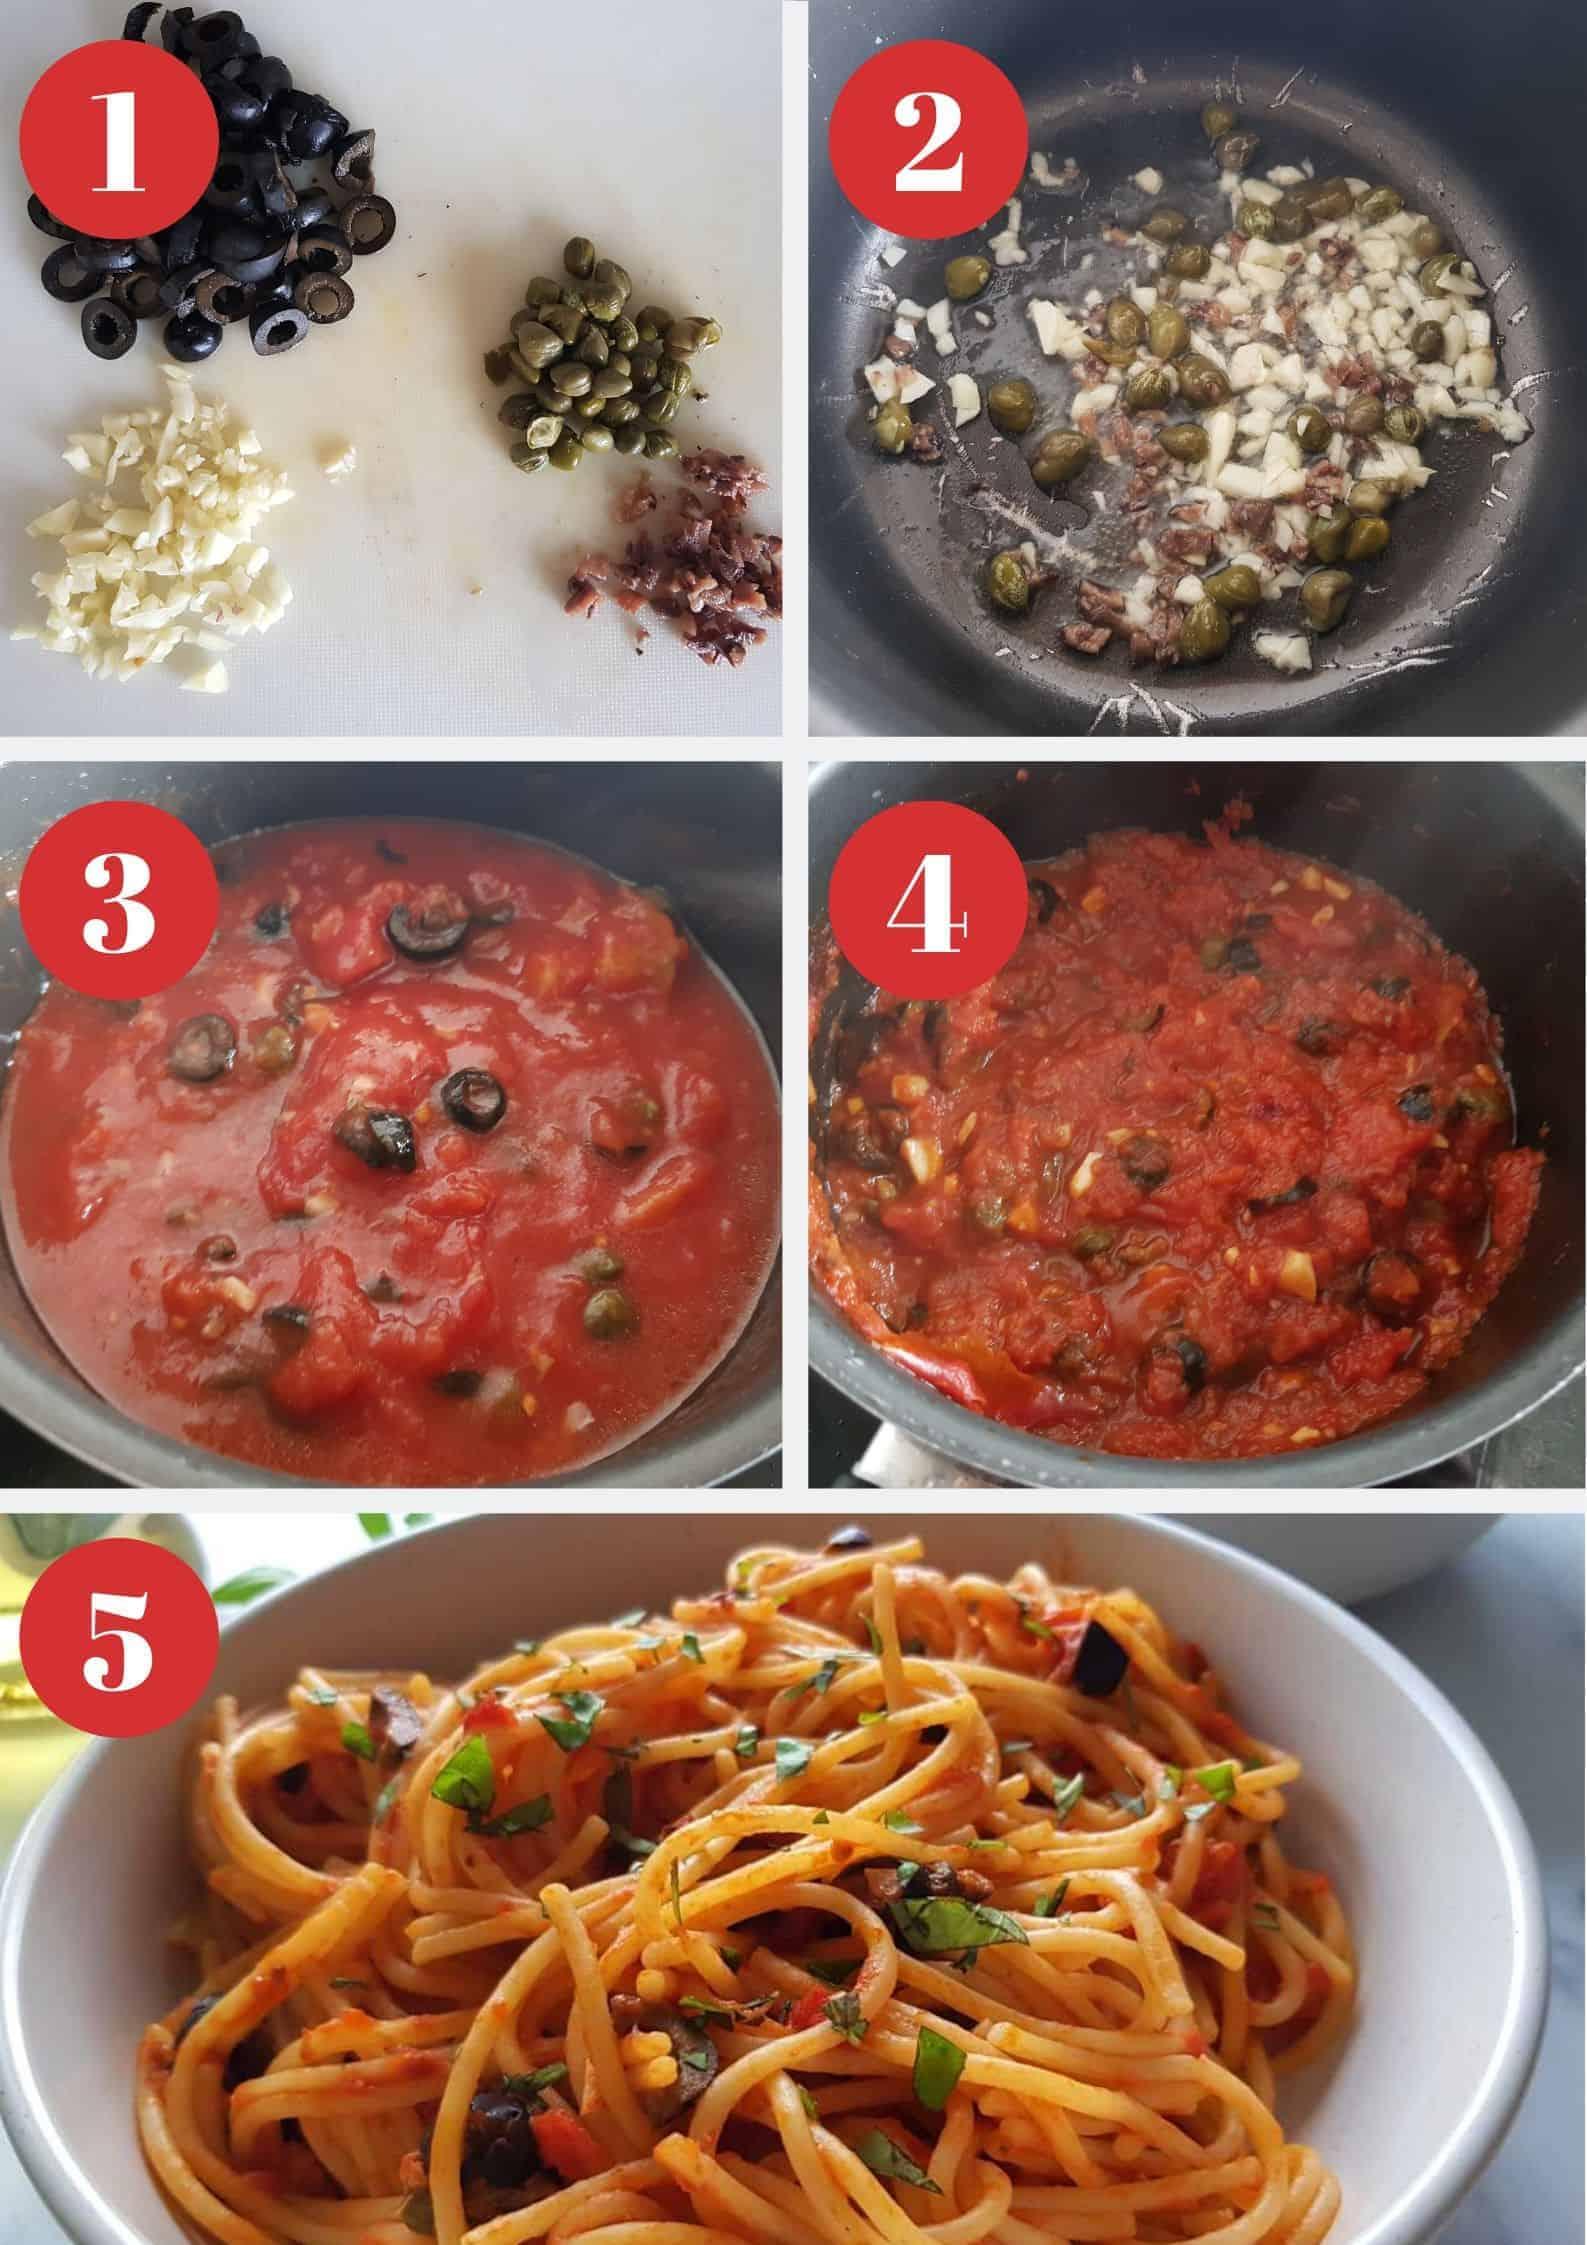 Infographic showing How to make spaghetti alla puttanesca.